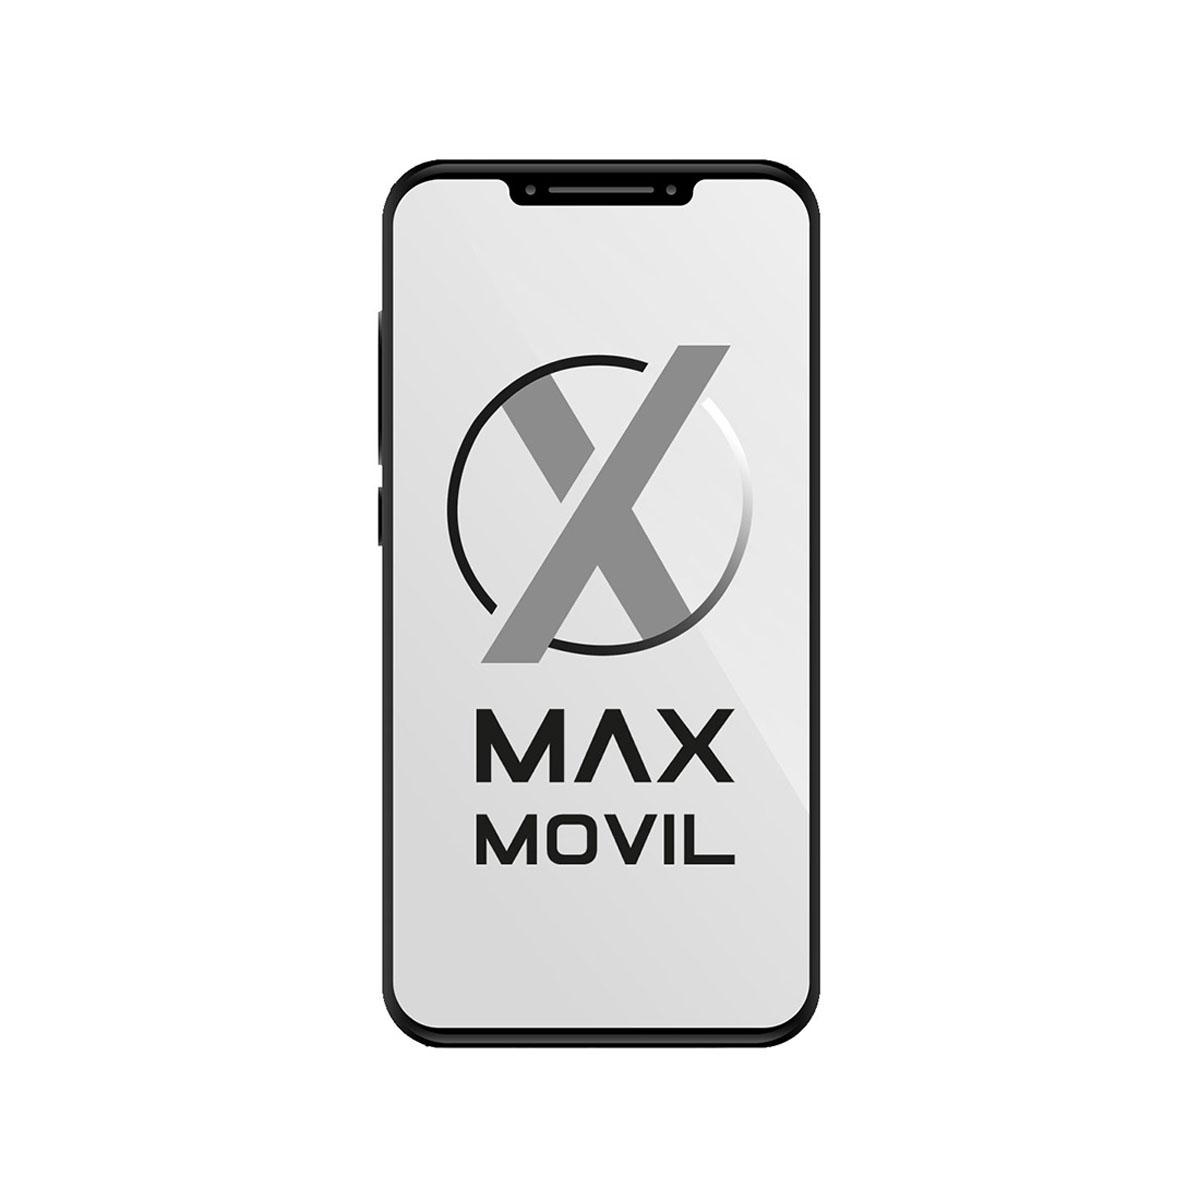 Funda libro Samsung EF-FI919BW blanco para Galaxy S4 Mini